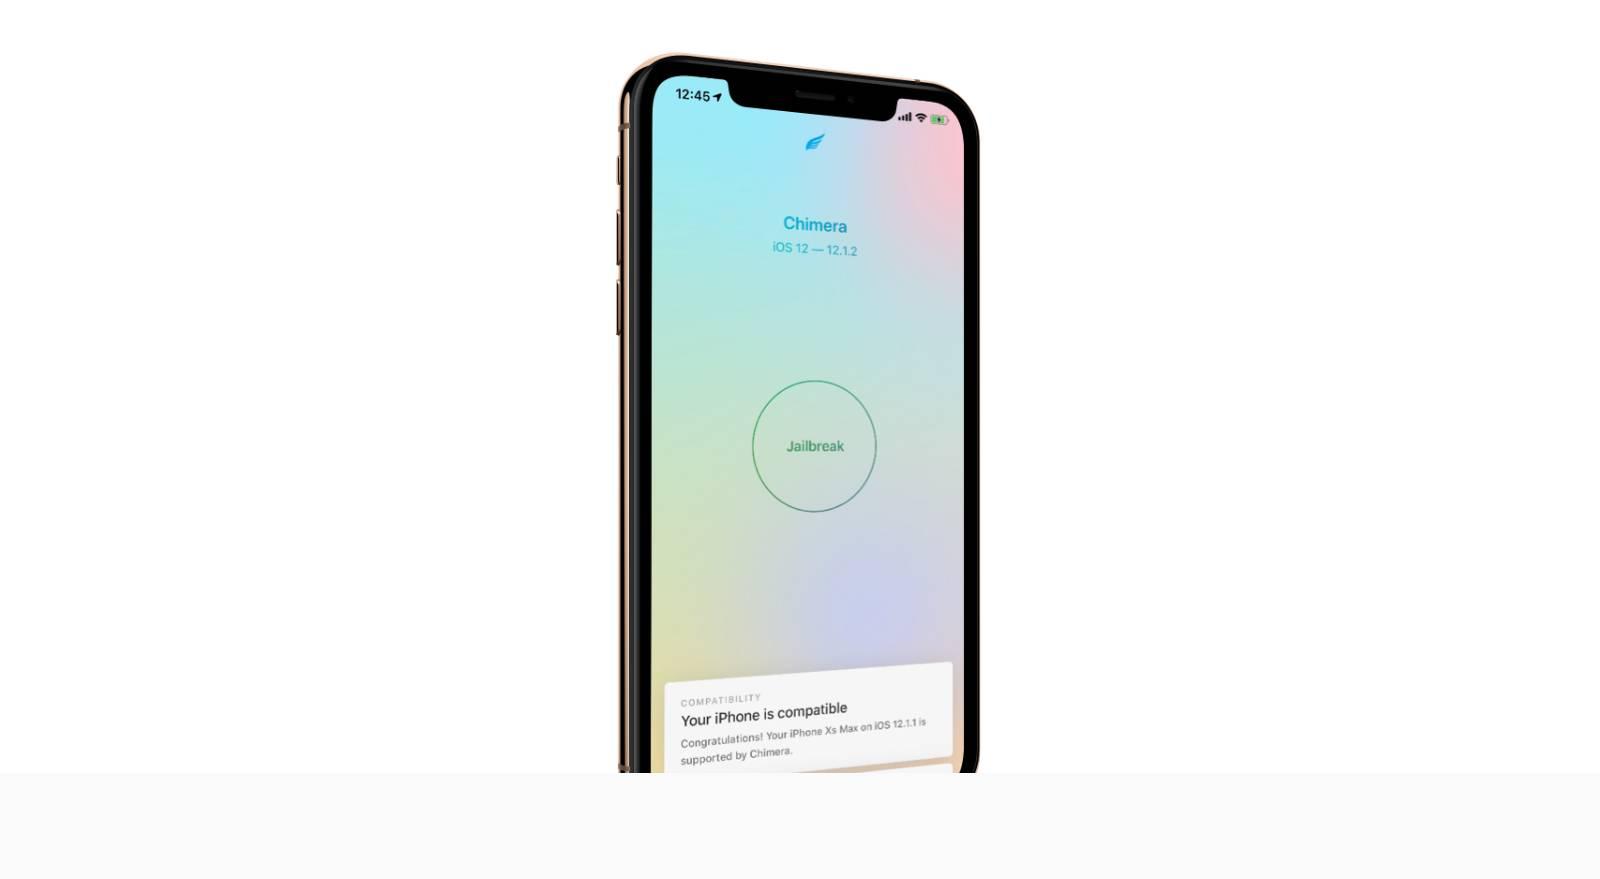 chimera jailbreak ios 12 iphone